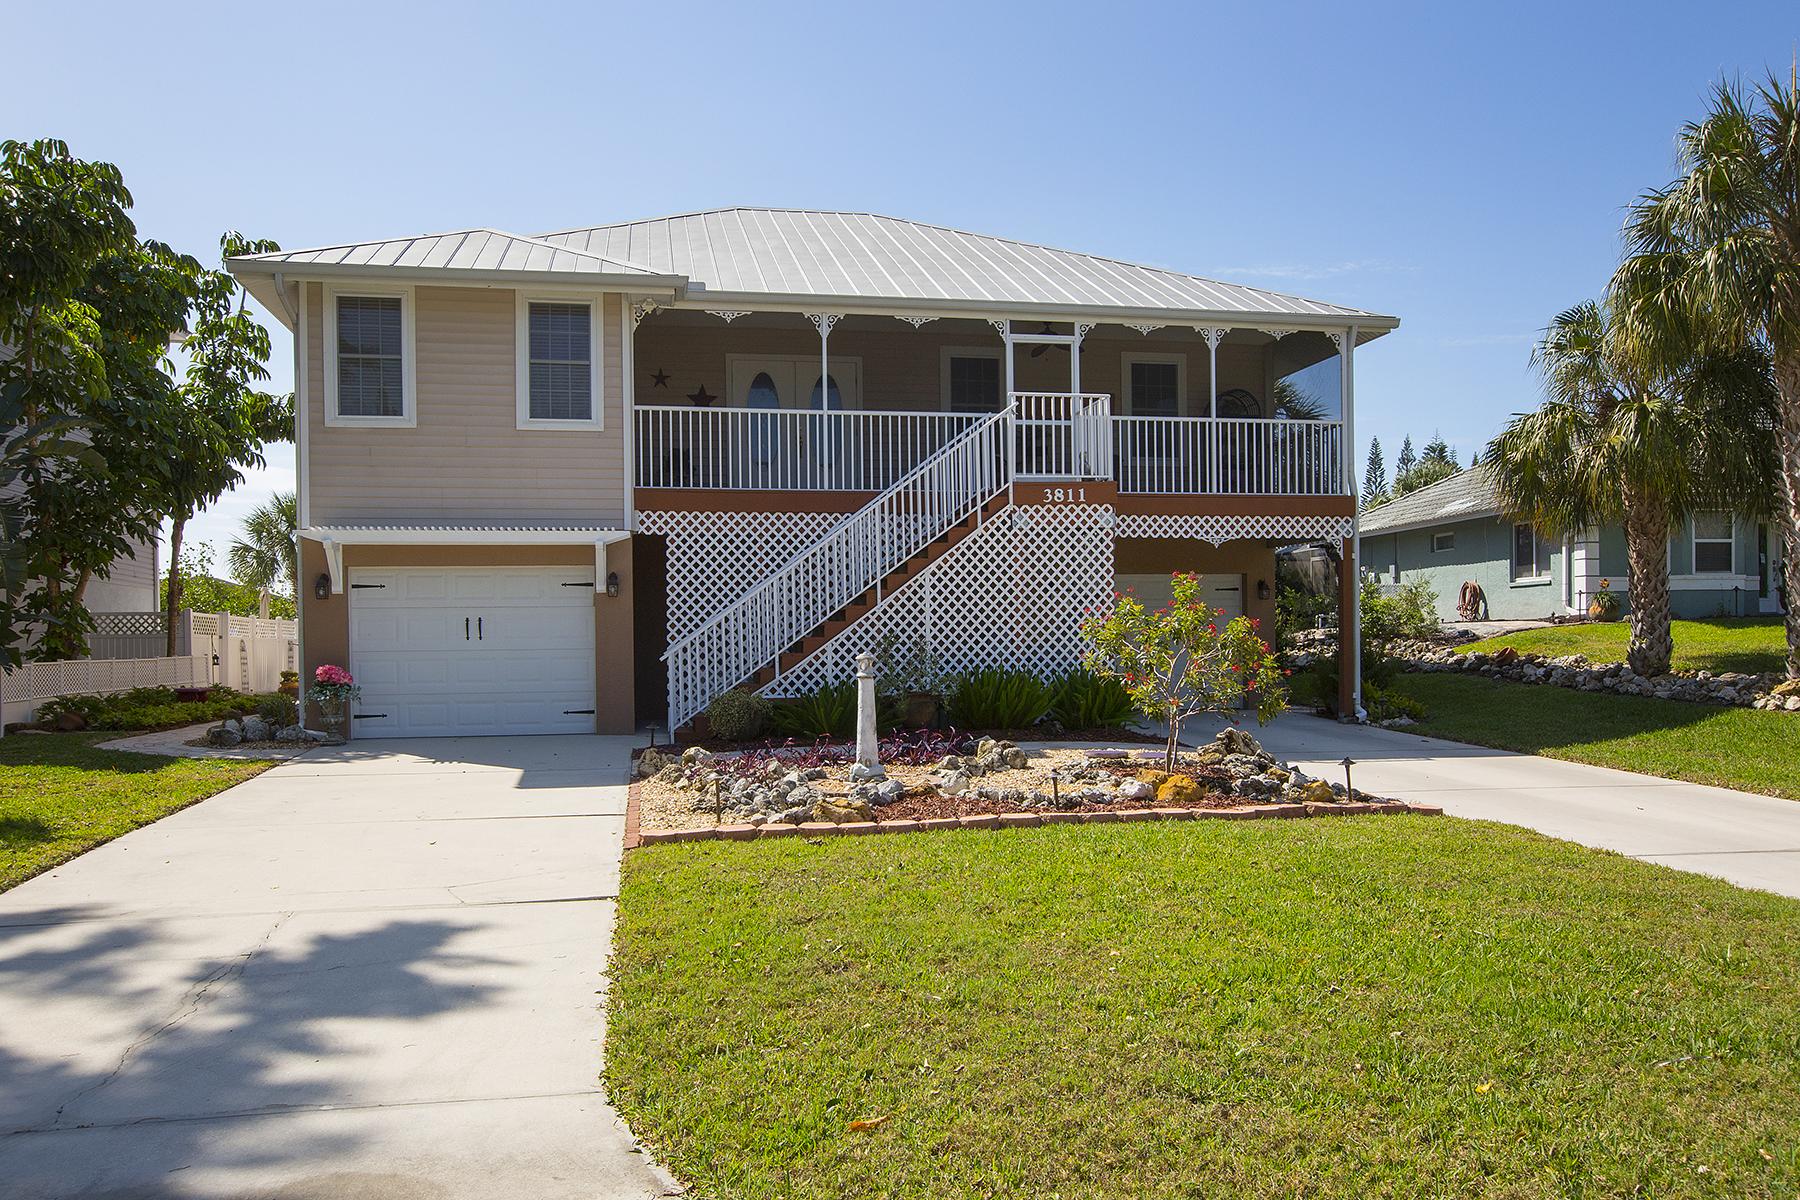 Single Family Home for Sale at RIVIERA COLONY 3811 Riviera Cir, Bonita Springs, Florida 34134 United States